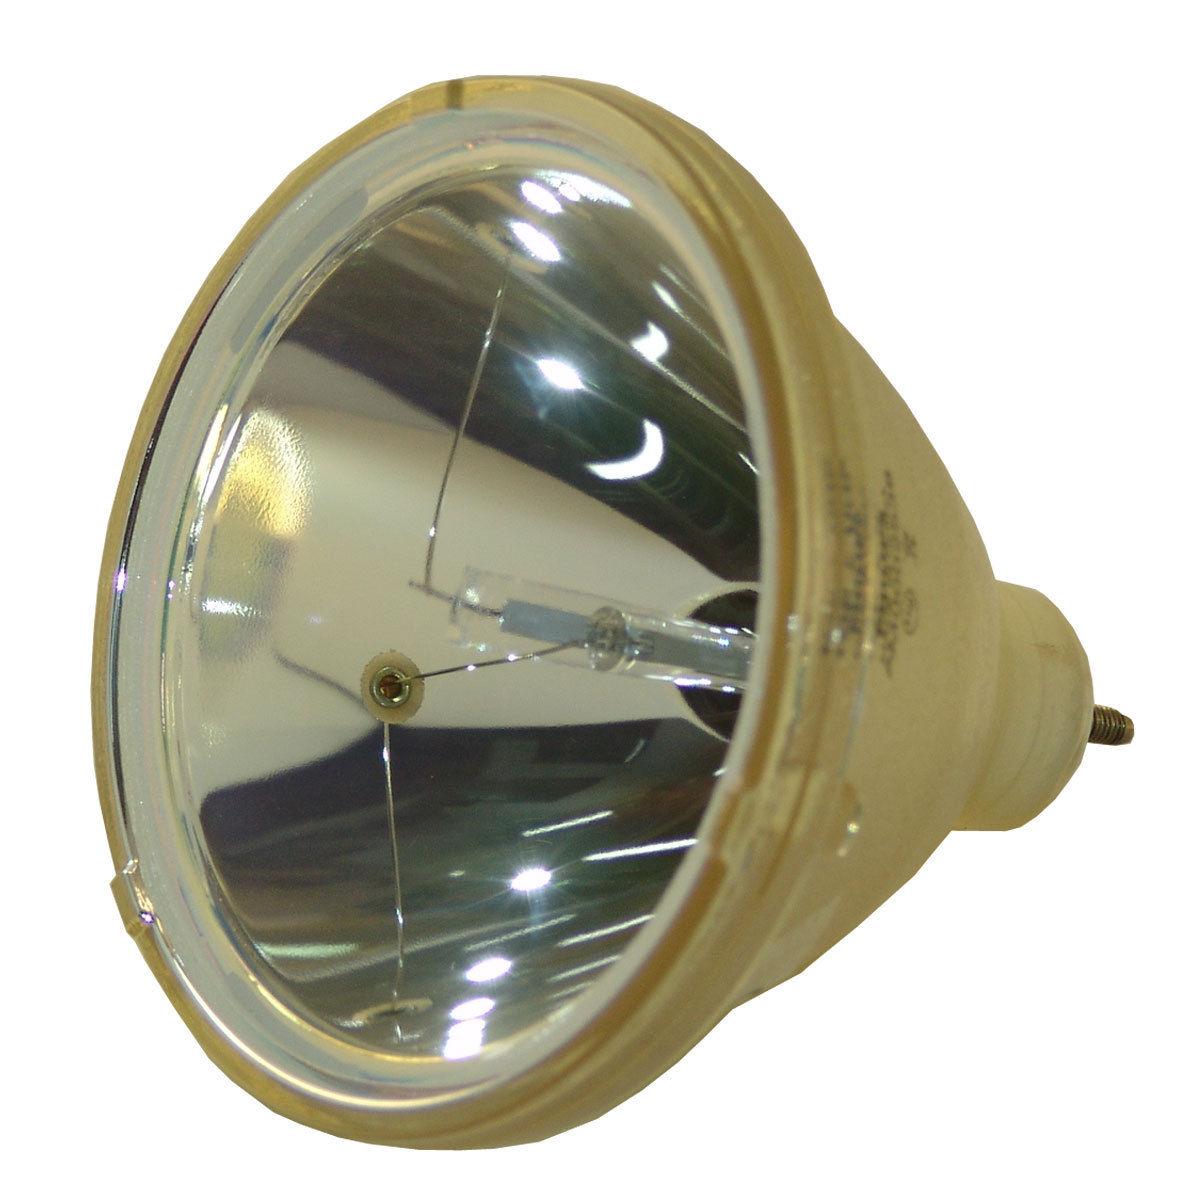 где купить  Compatible Bare Bulb POA-LMP29 LMP29 610-284-4627 for SANYO PLC-XF20 PLV-XF20E PLC-XF21 PLC-XF21E/Eiki LC-XT1 LC-XT1D Projector  дешево